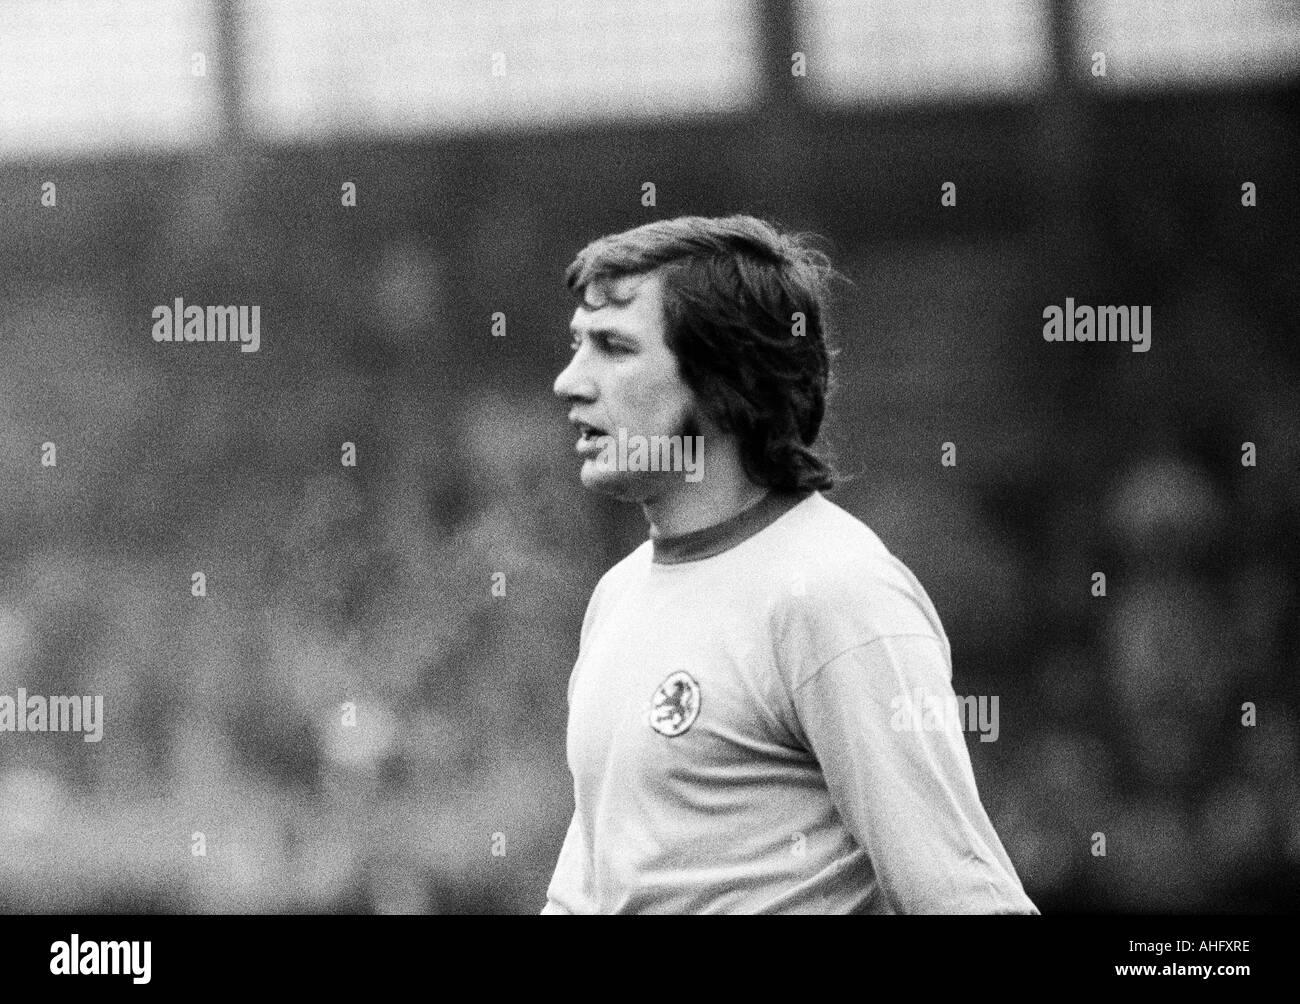 football, Bundesliga, 1972/1973, VfL Bochum versus Eintracht Brunswick 2:2, Stadium at the Castroper Strasse in Bochum, football player, Franz Merkhoffer (BS) - Stock Image